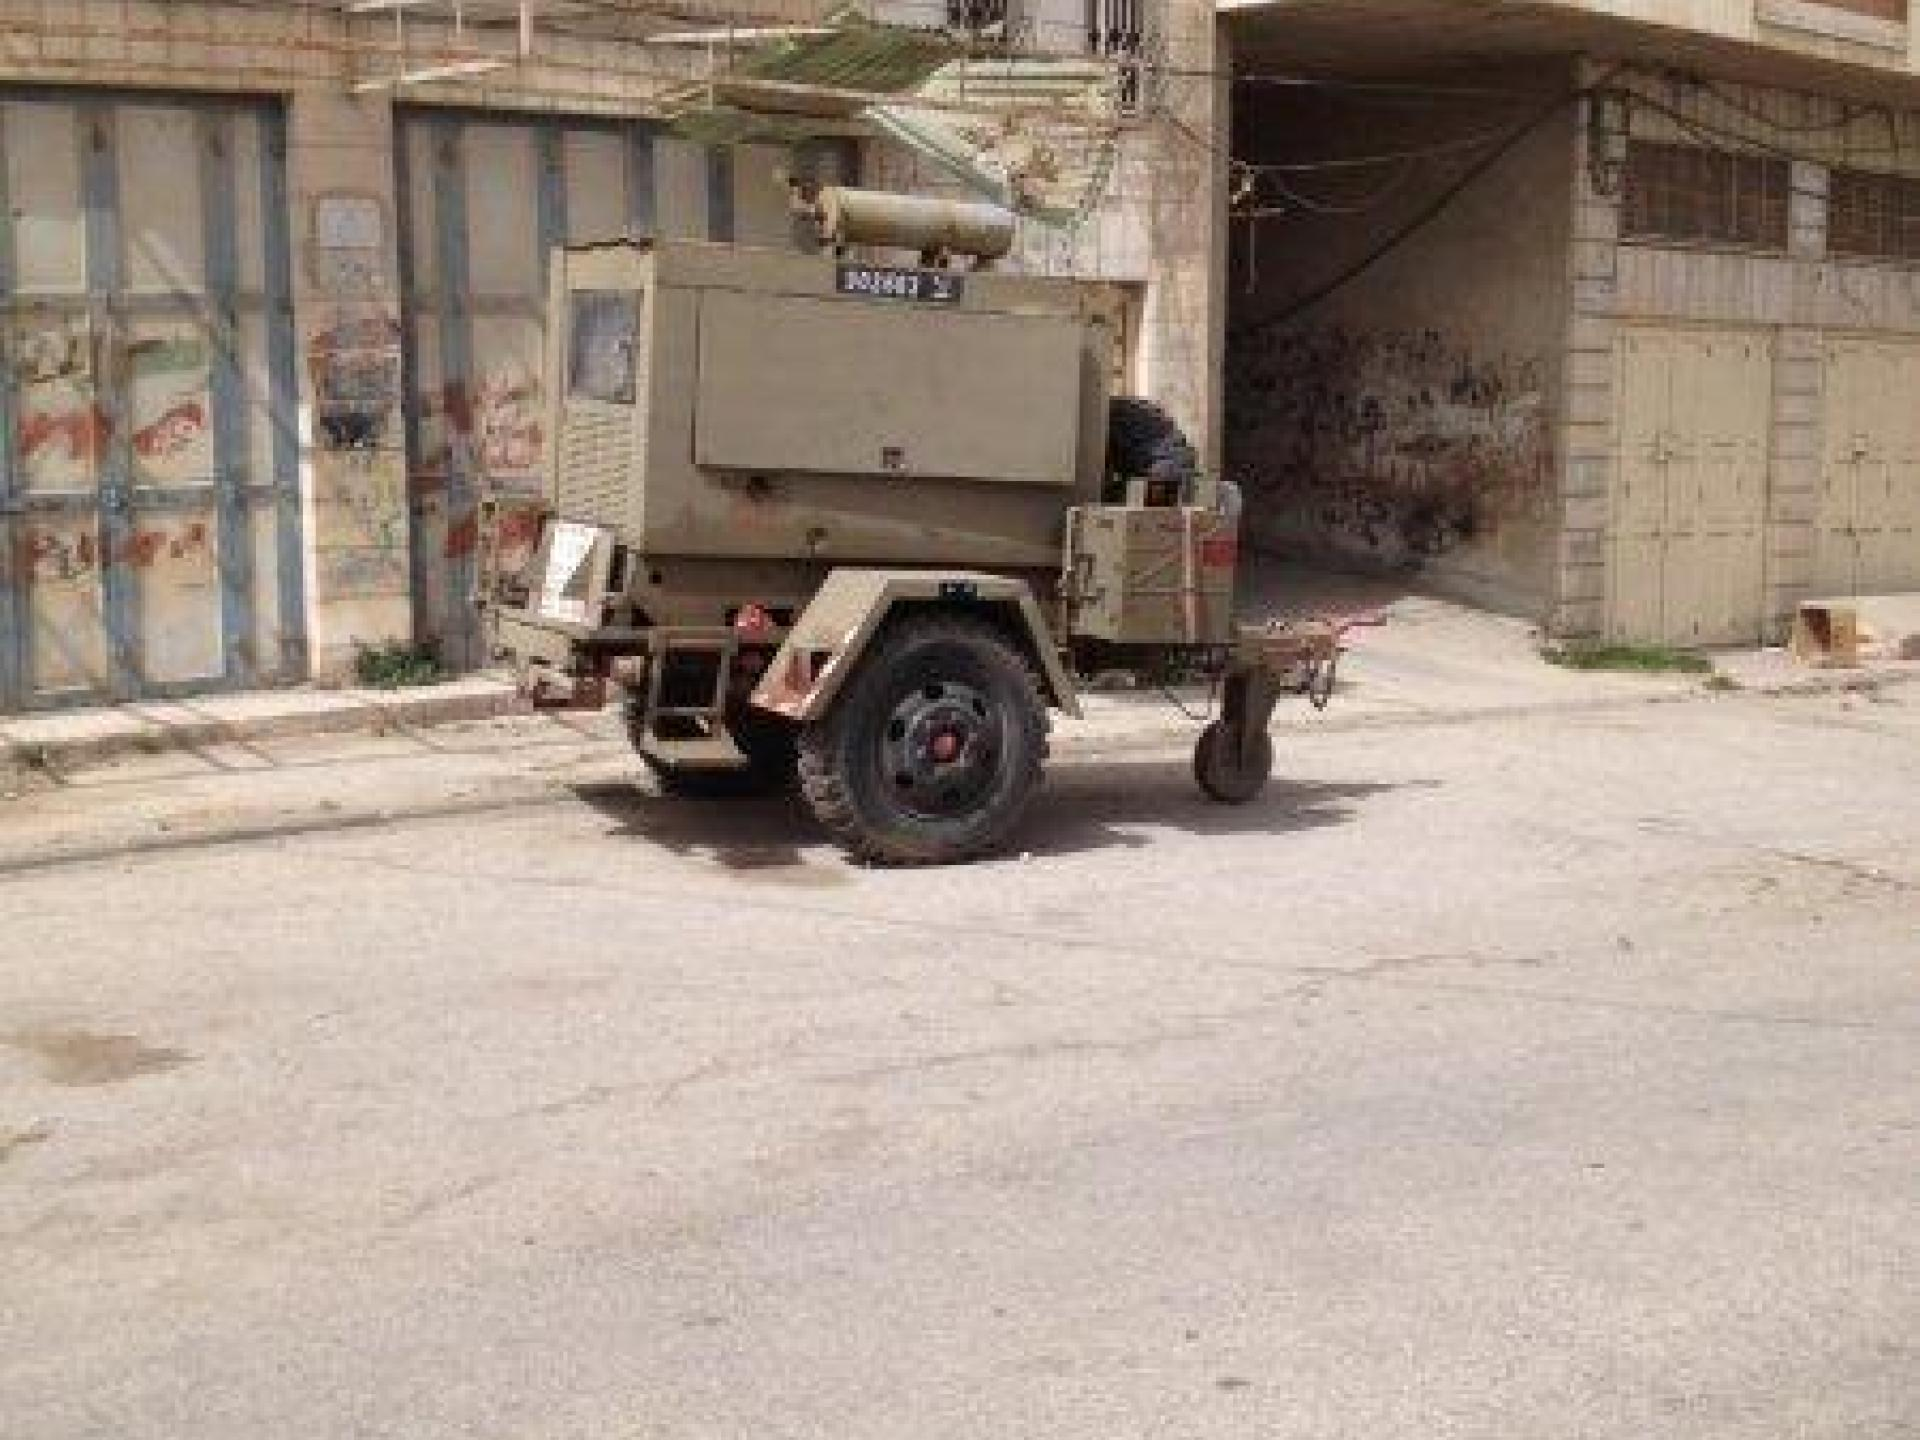 Hebron, Pharmacy checkpoint 08.04.13